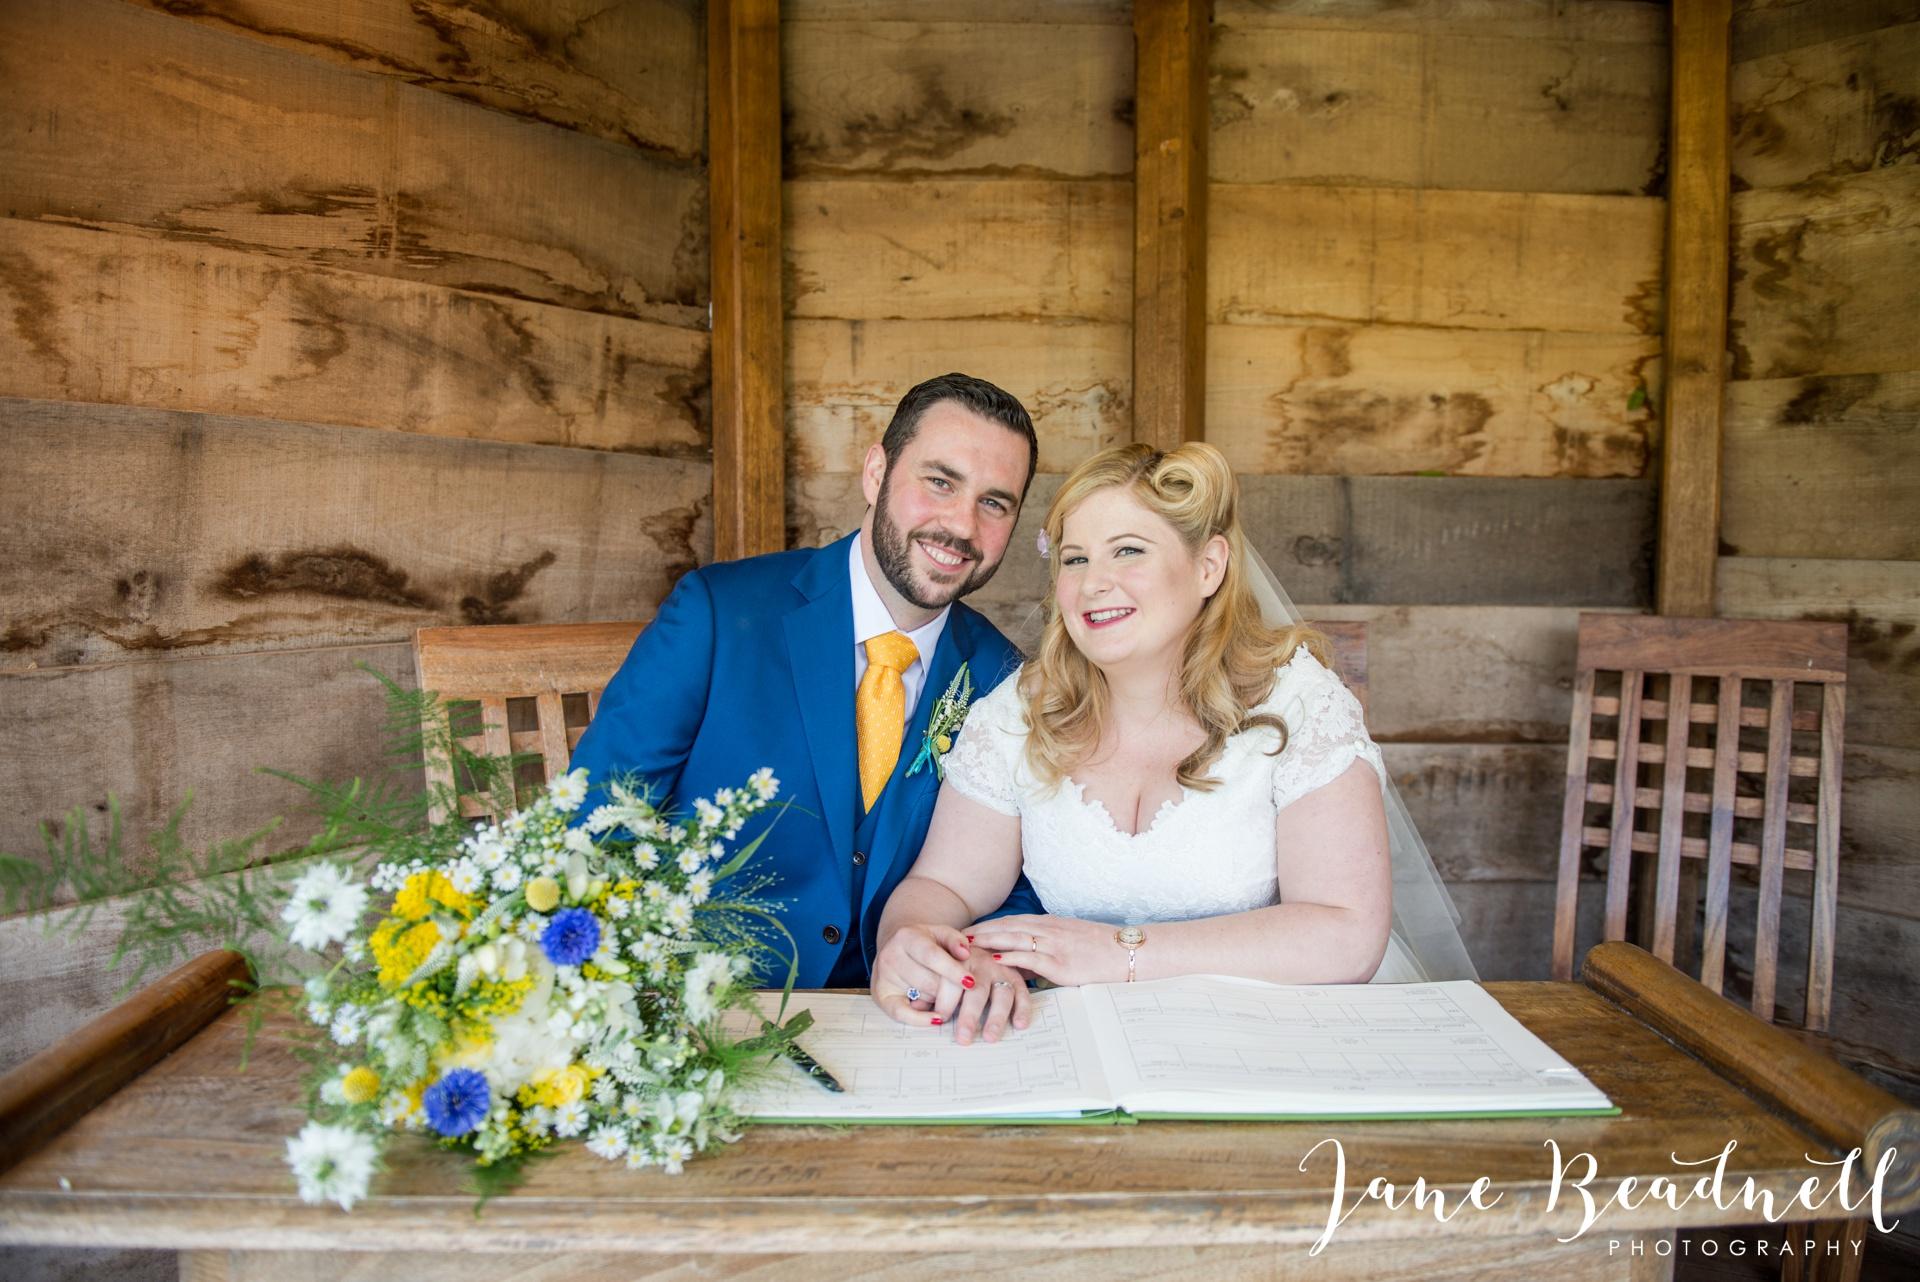 South Farm Wedding photography Hertfordshire by Jane Beadnell Photography fine art wedding photographer_0075